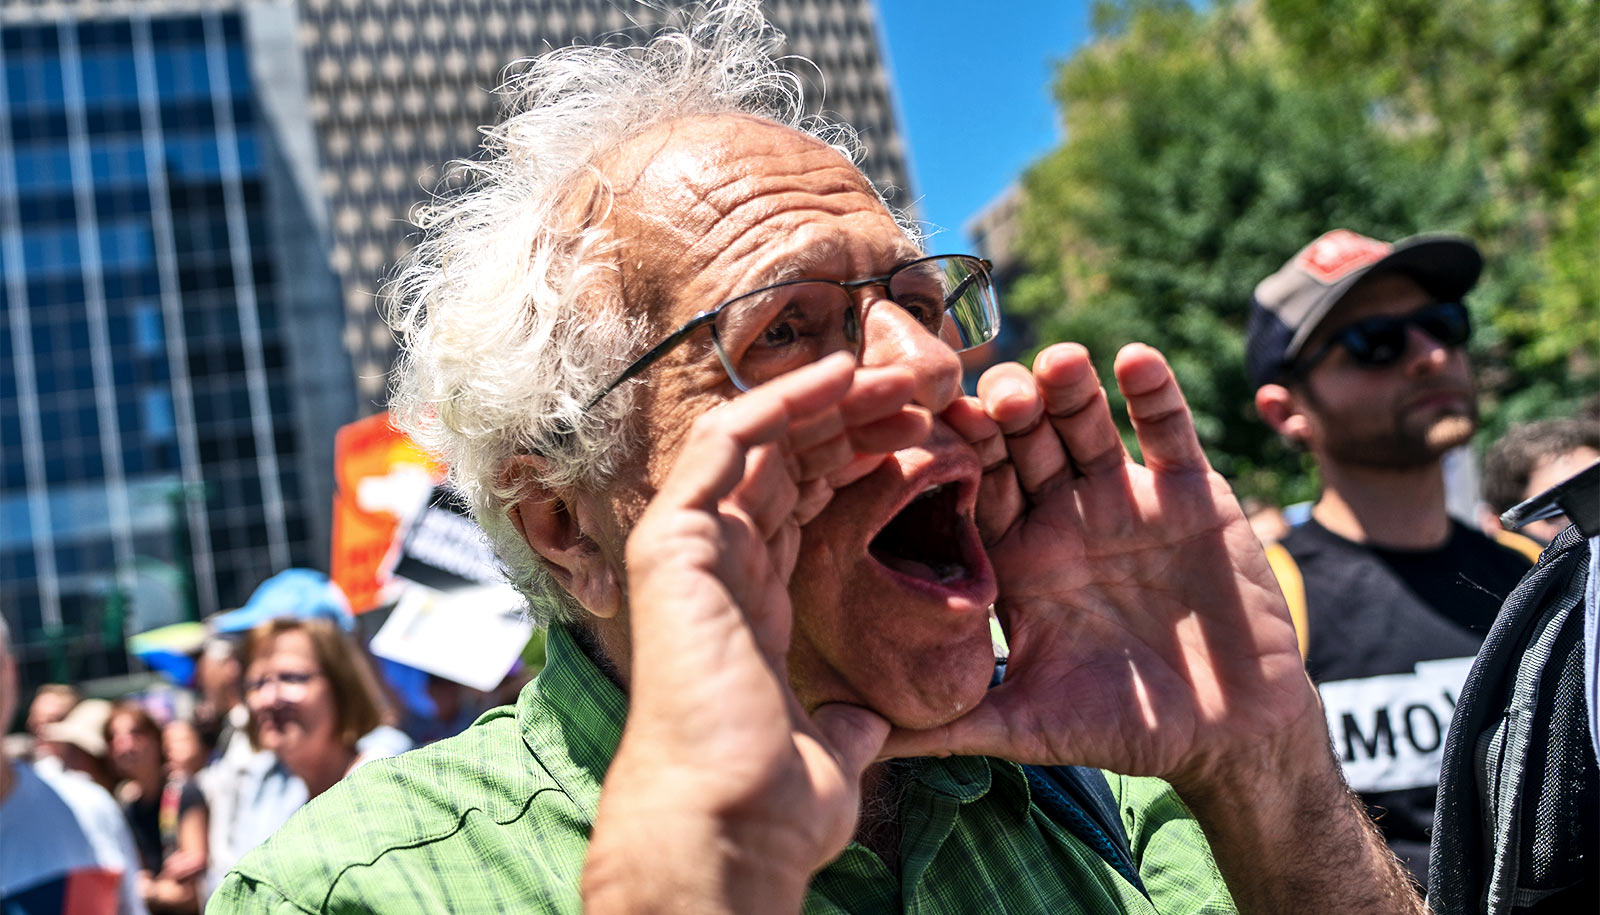 4 ways to move beyond gridlock in touchy debates